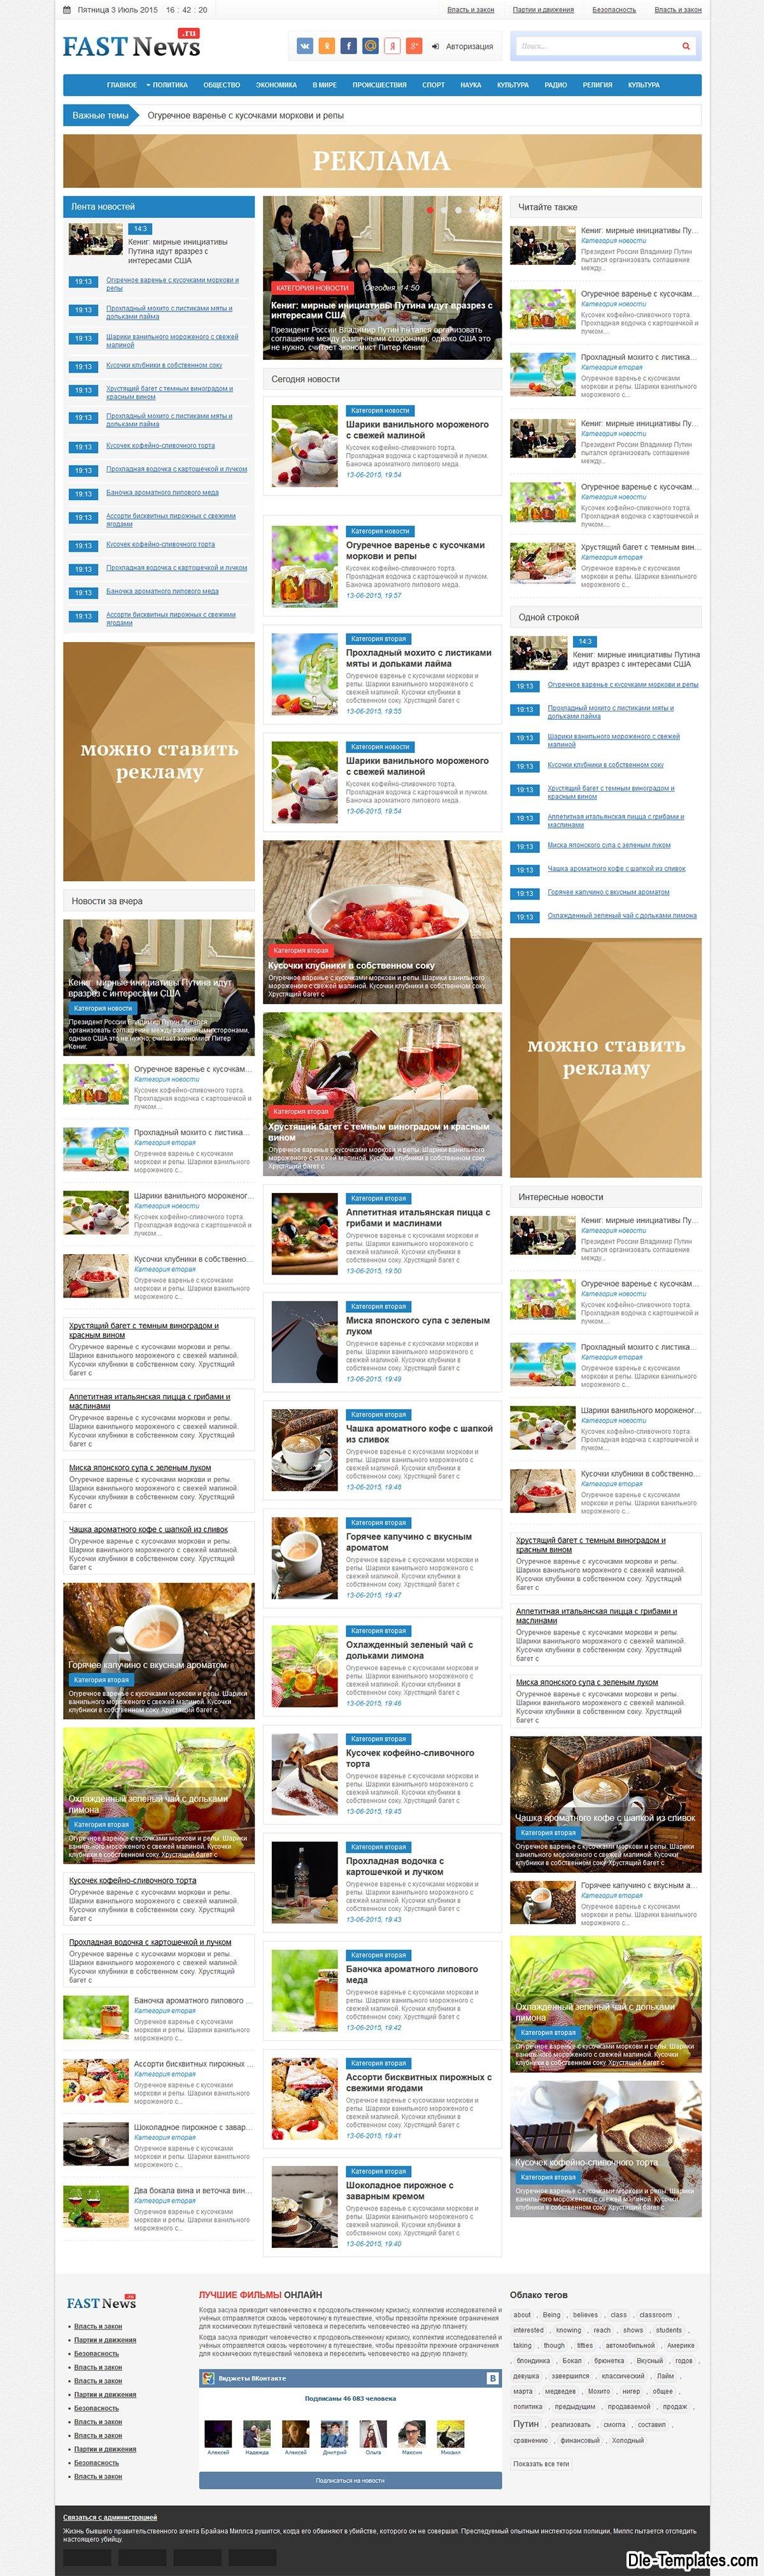 Fast News - адаптивный новостной шаблон для DLE | Template